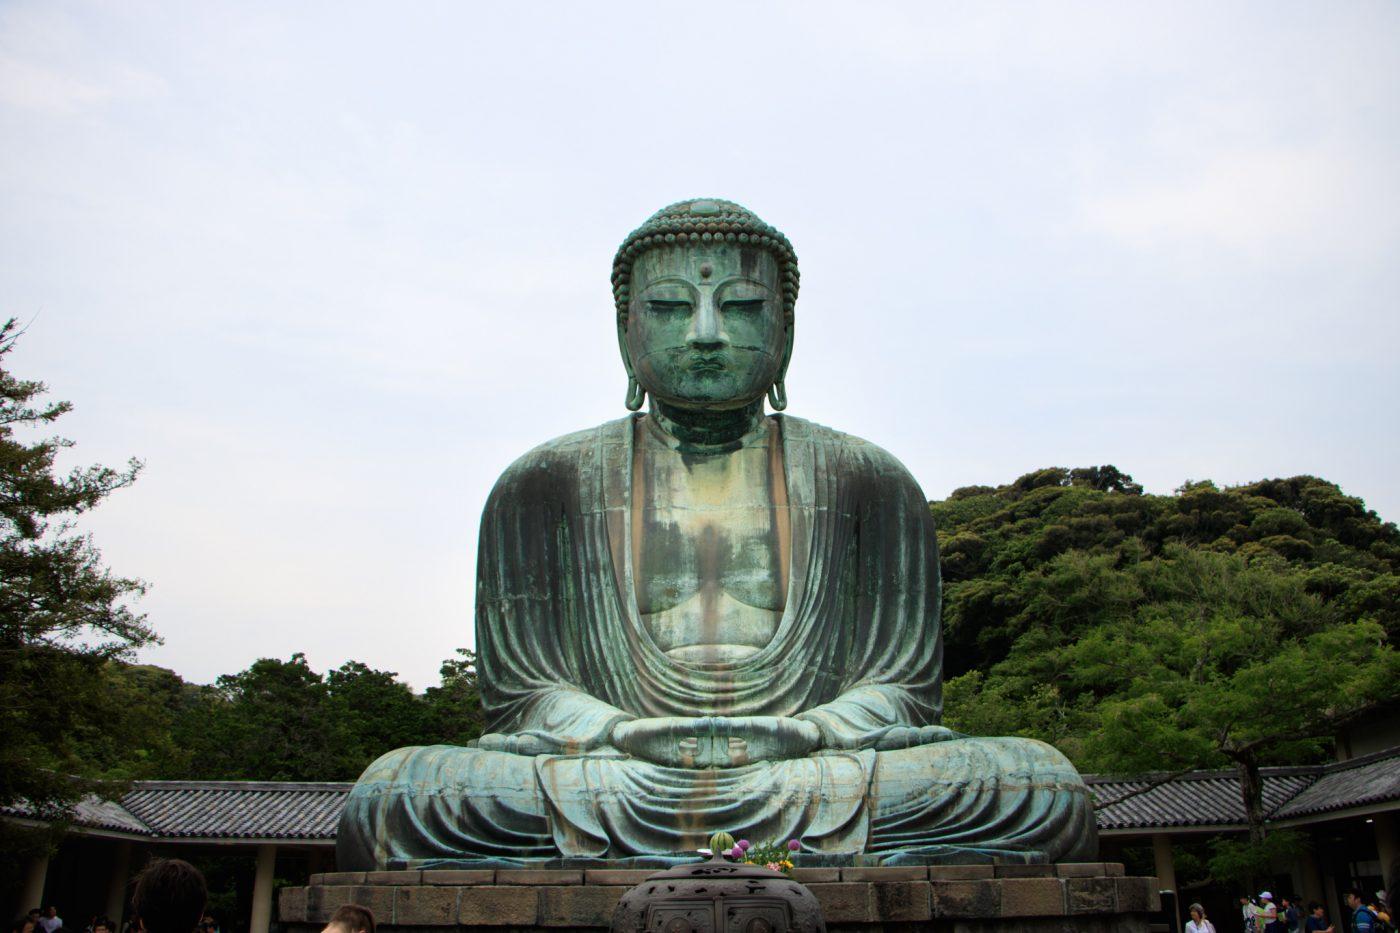 Der Buddha von Hase (Kamakura), Daibudsu, Japan